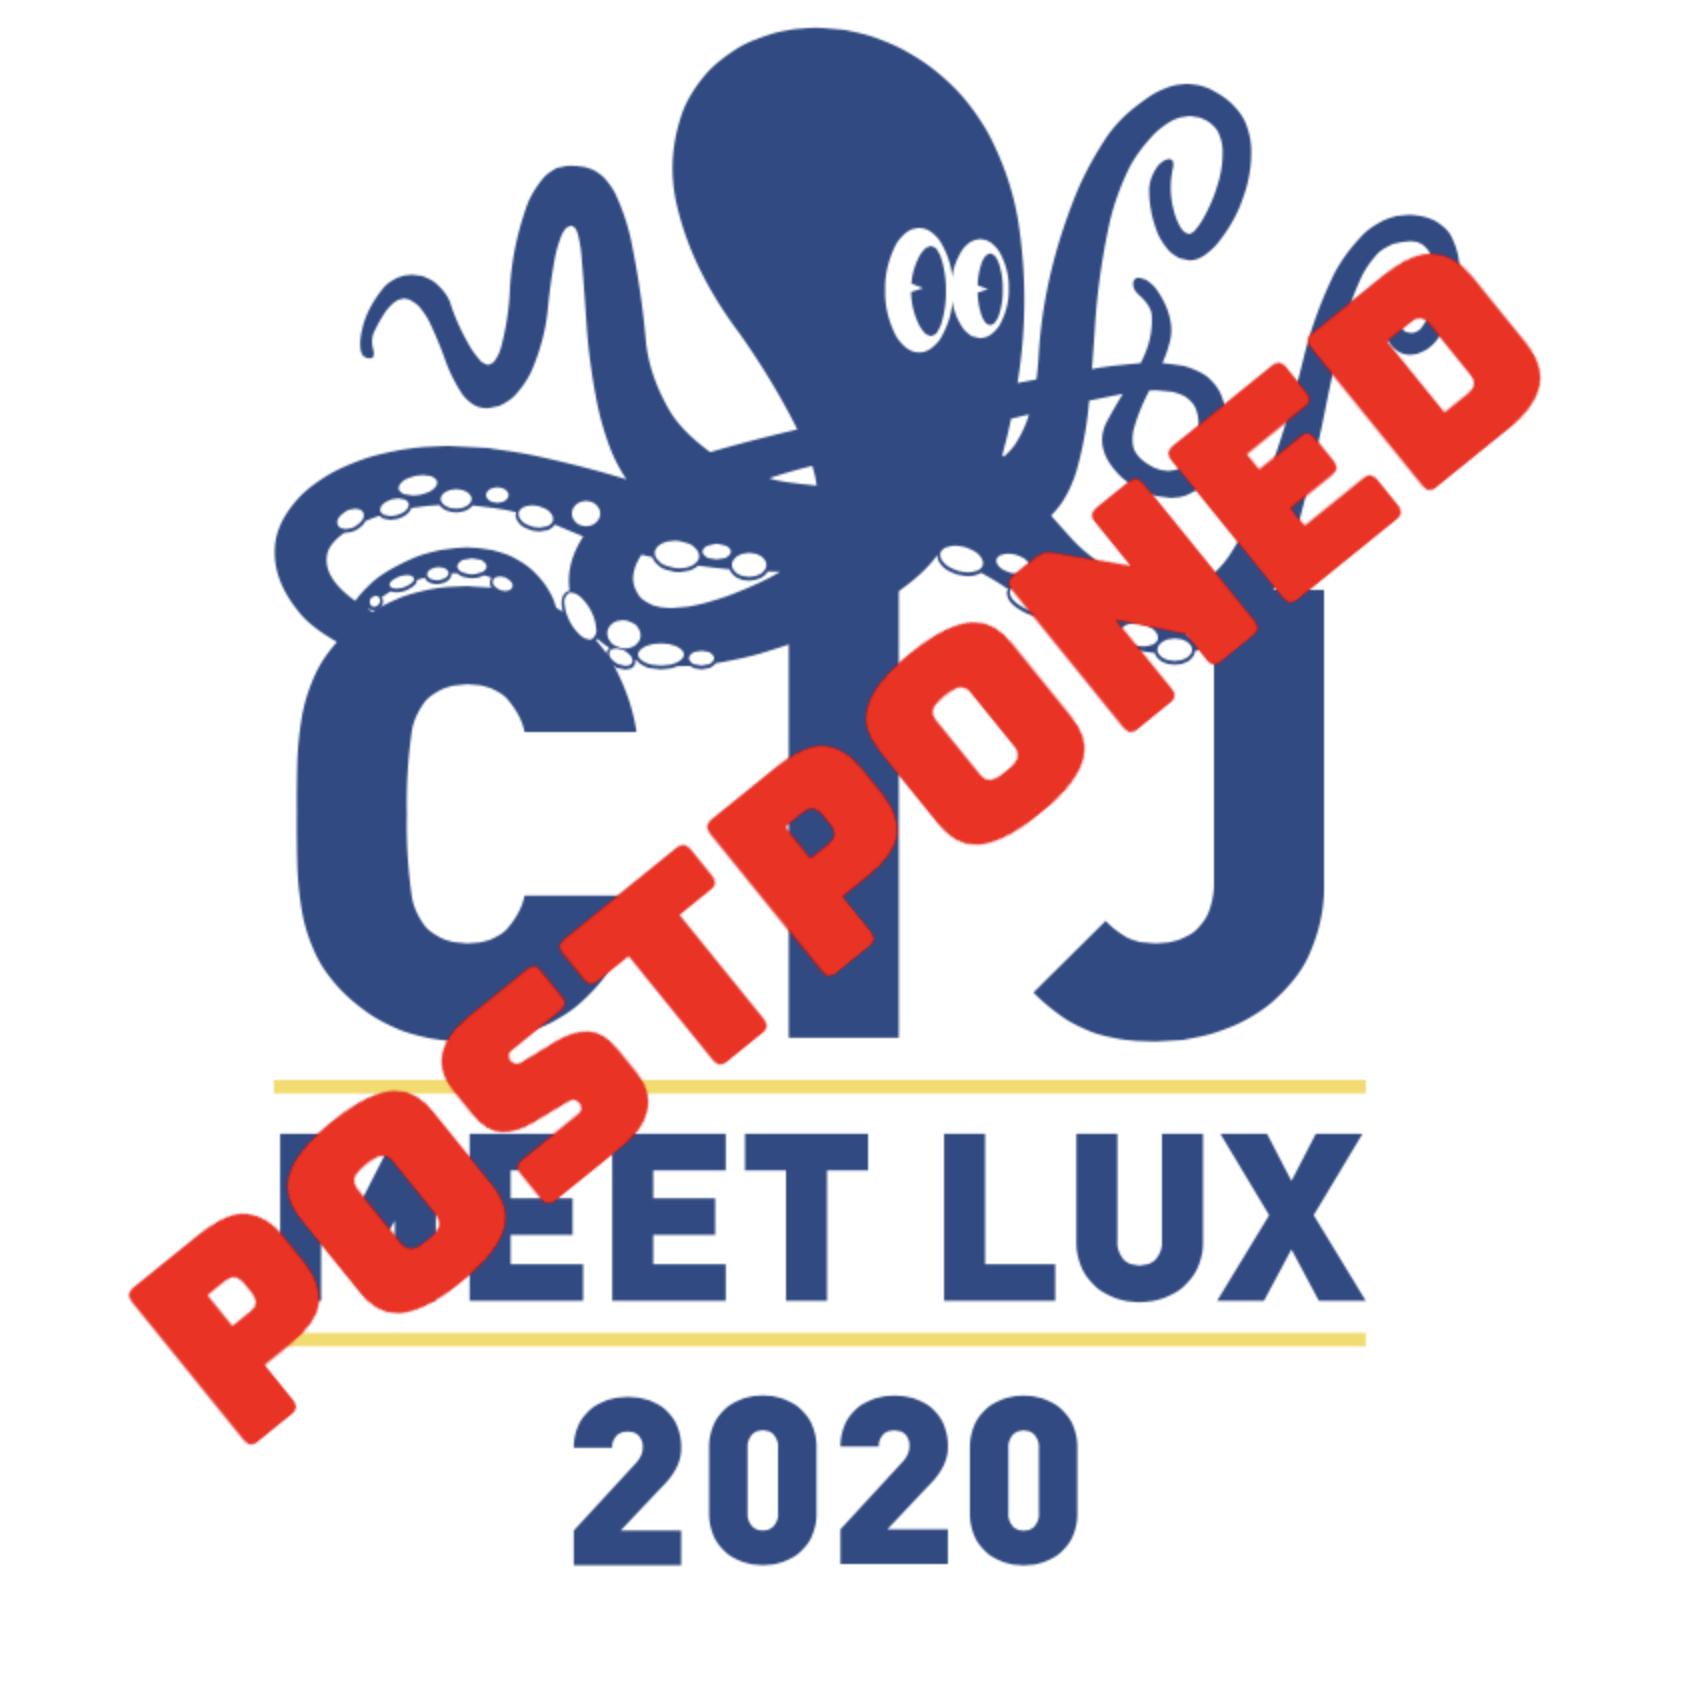 CIJ 2020 and COVID-19